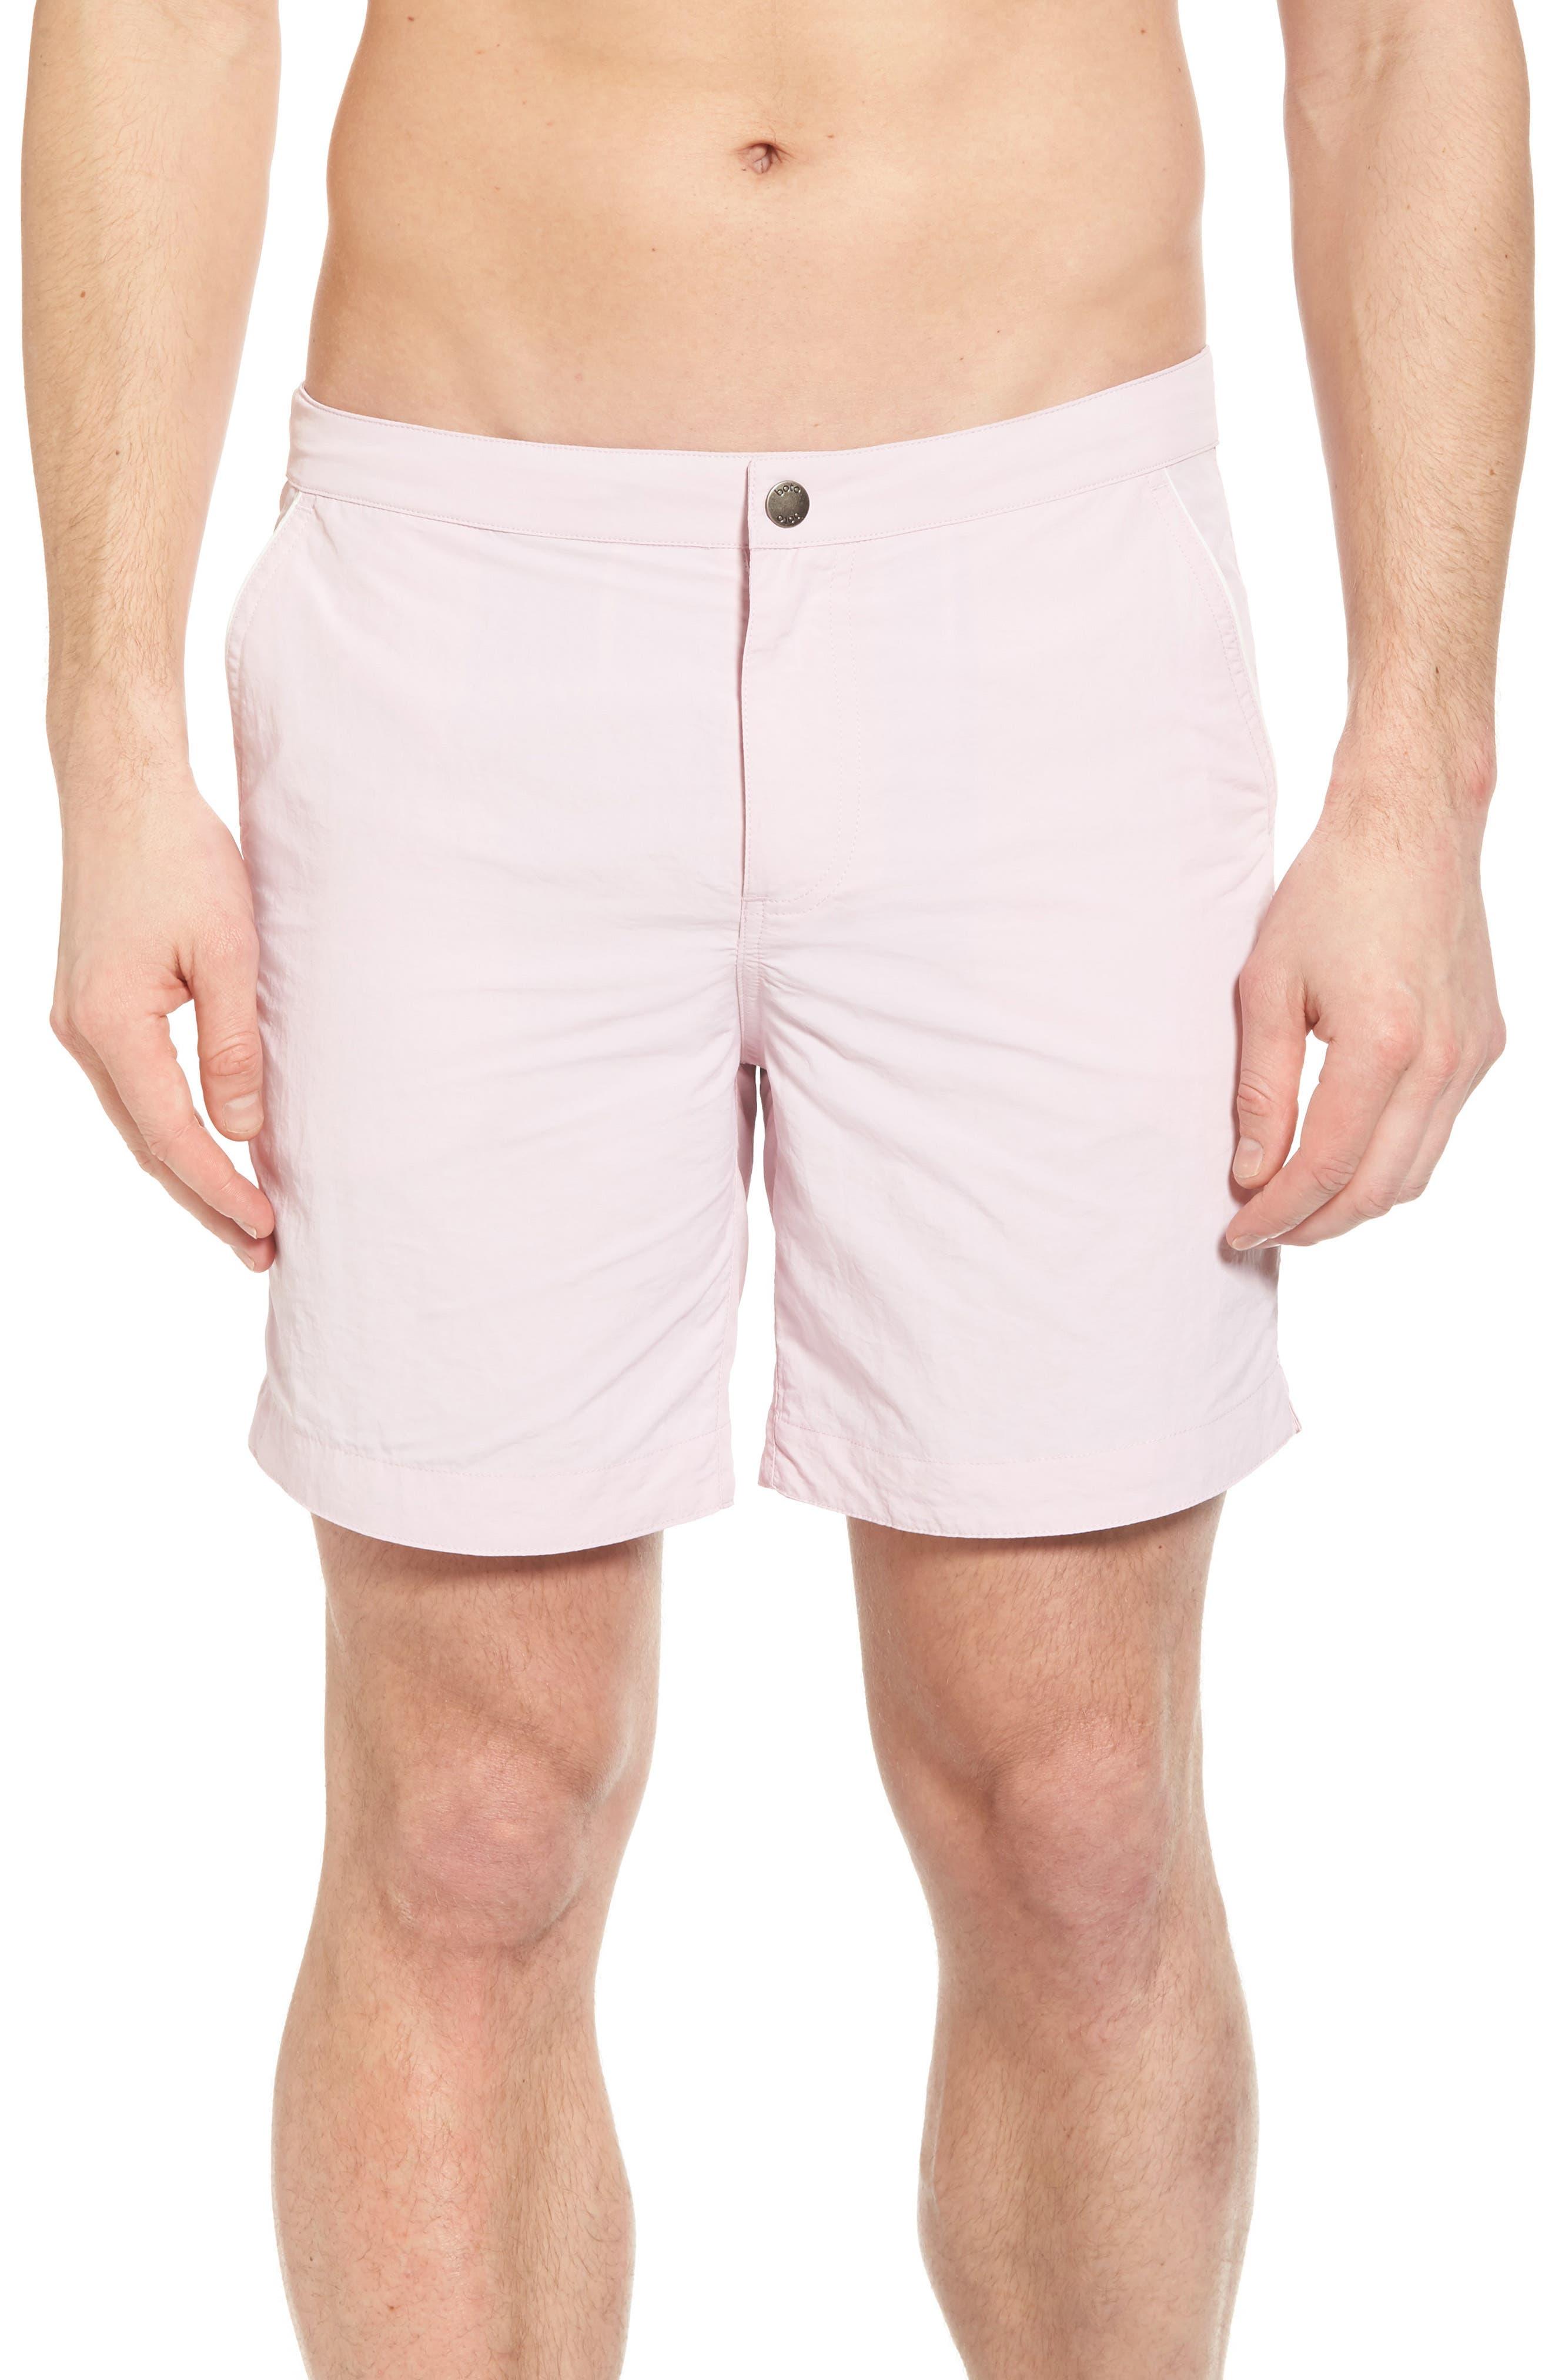 Rio Regular Fit Swim Trunks,                         Main,                         color, Pastel Pink Solid